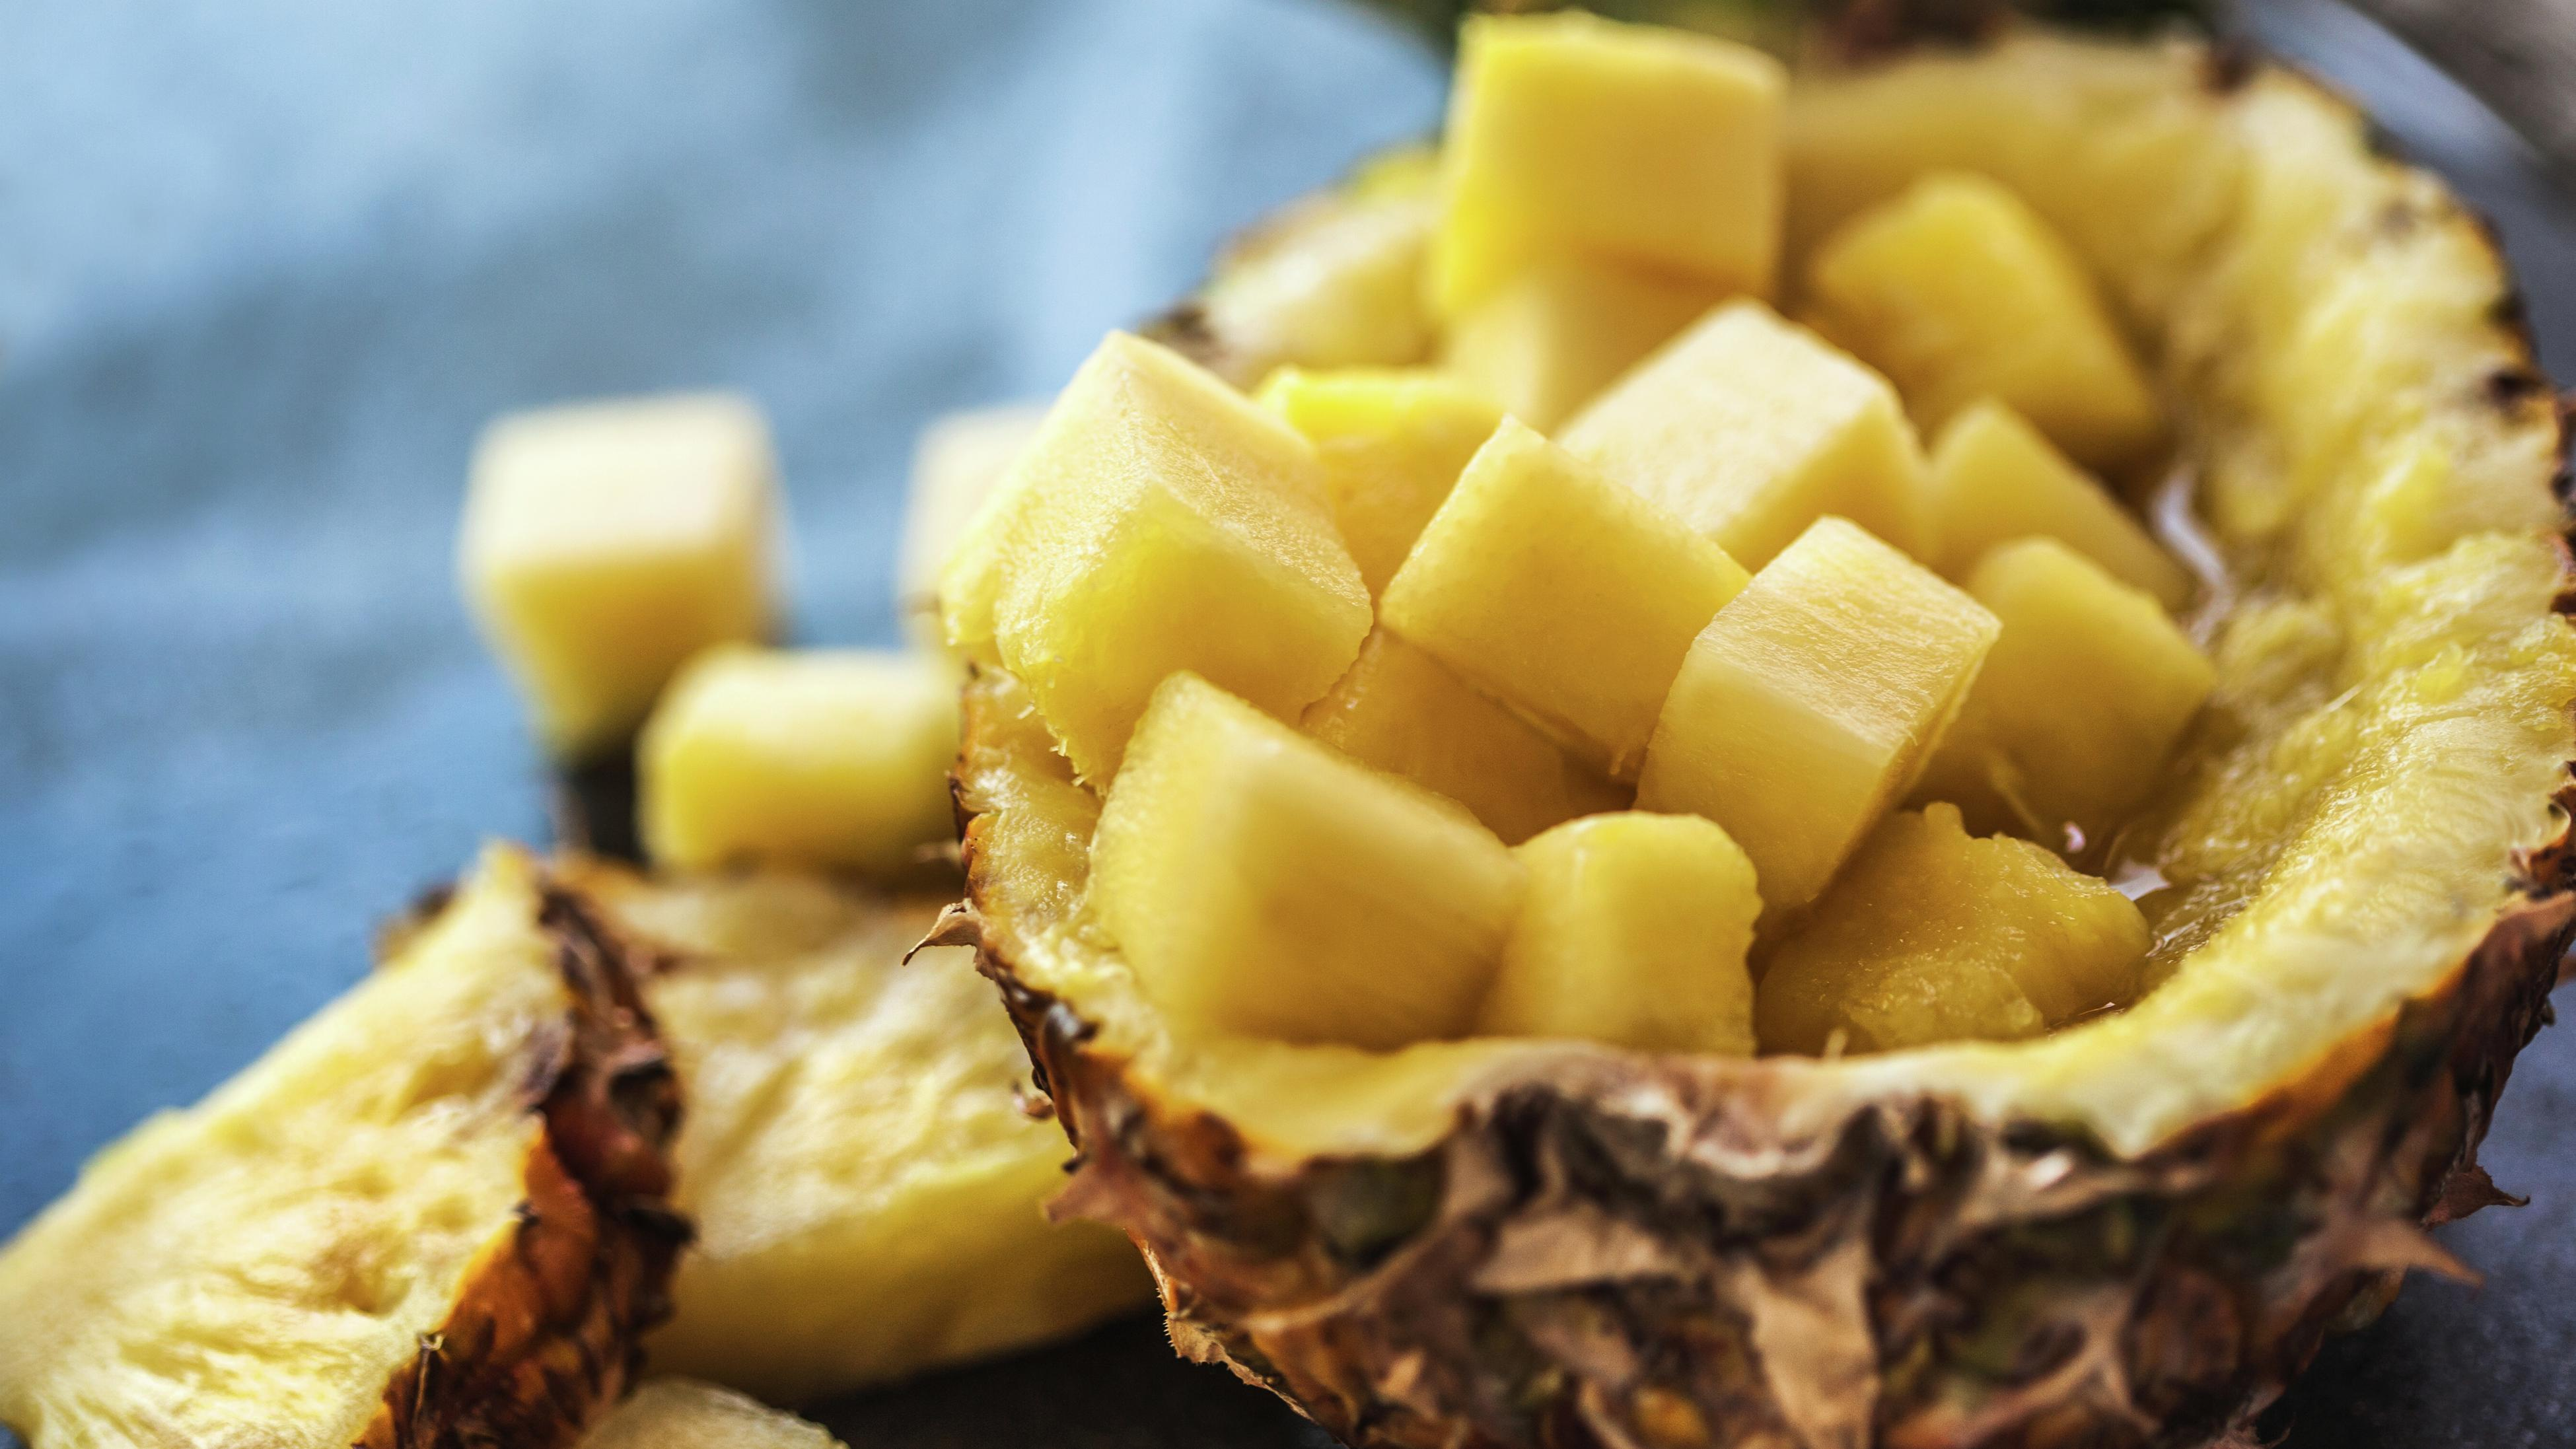 Pineapple cut into chunks